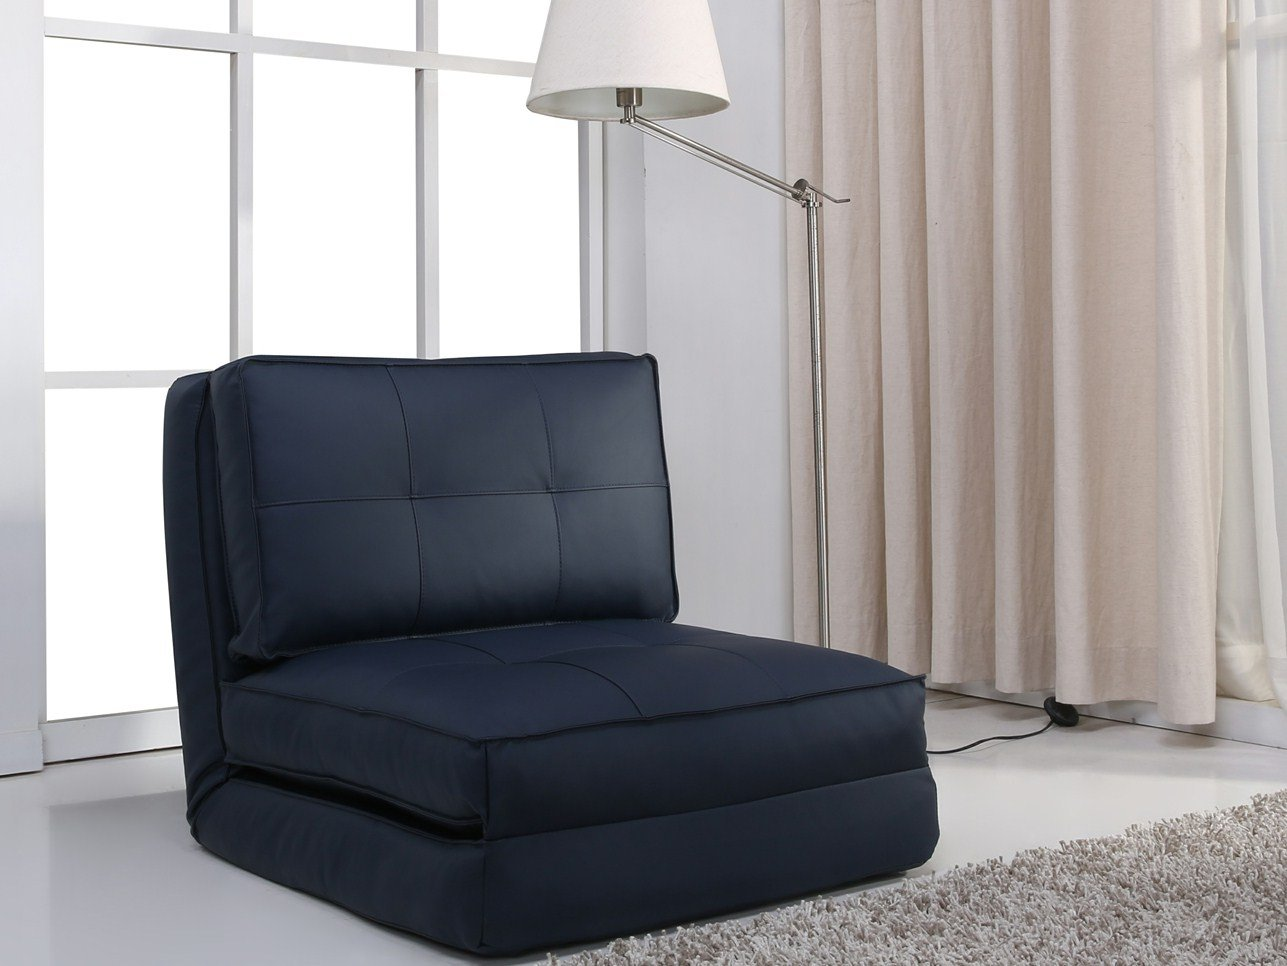 ARTDECO Schlafsessel Jugendsessel Gästebett Kindersessel Klappsessel Kunstleder dunkelblau groß